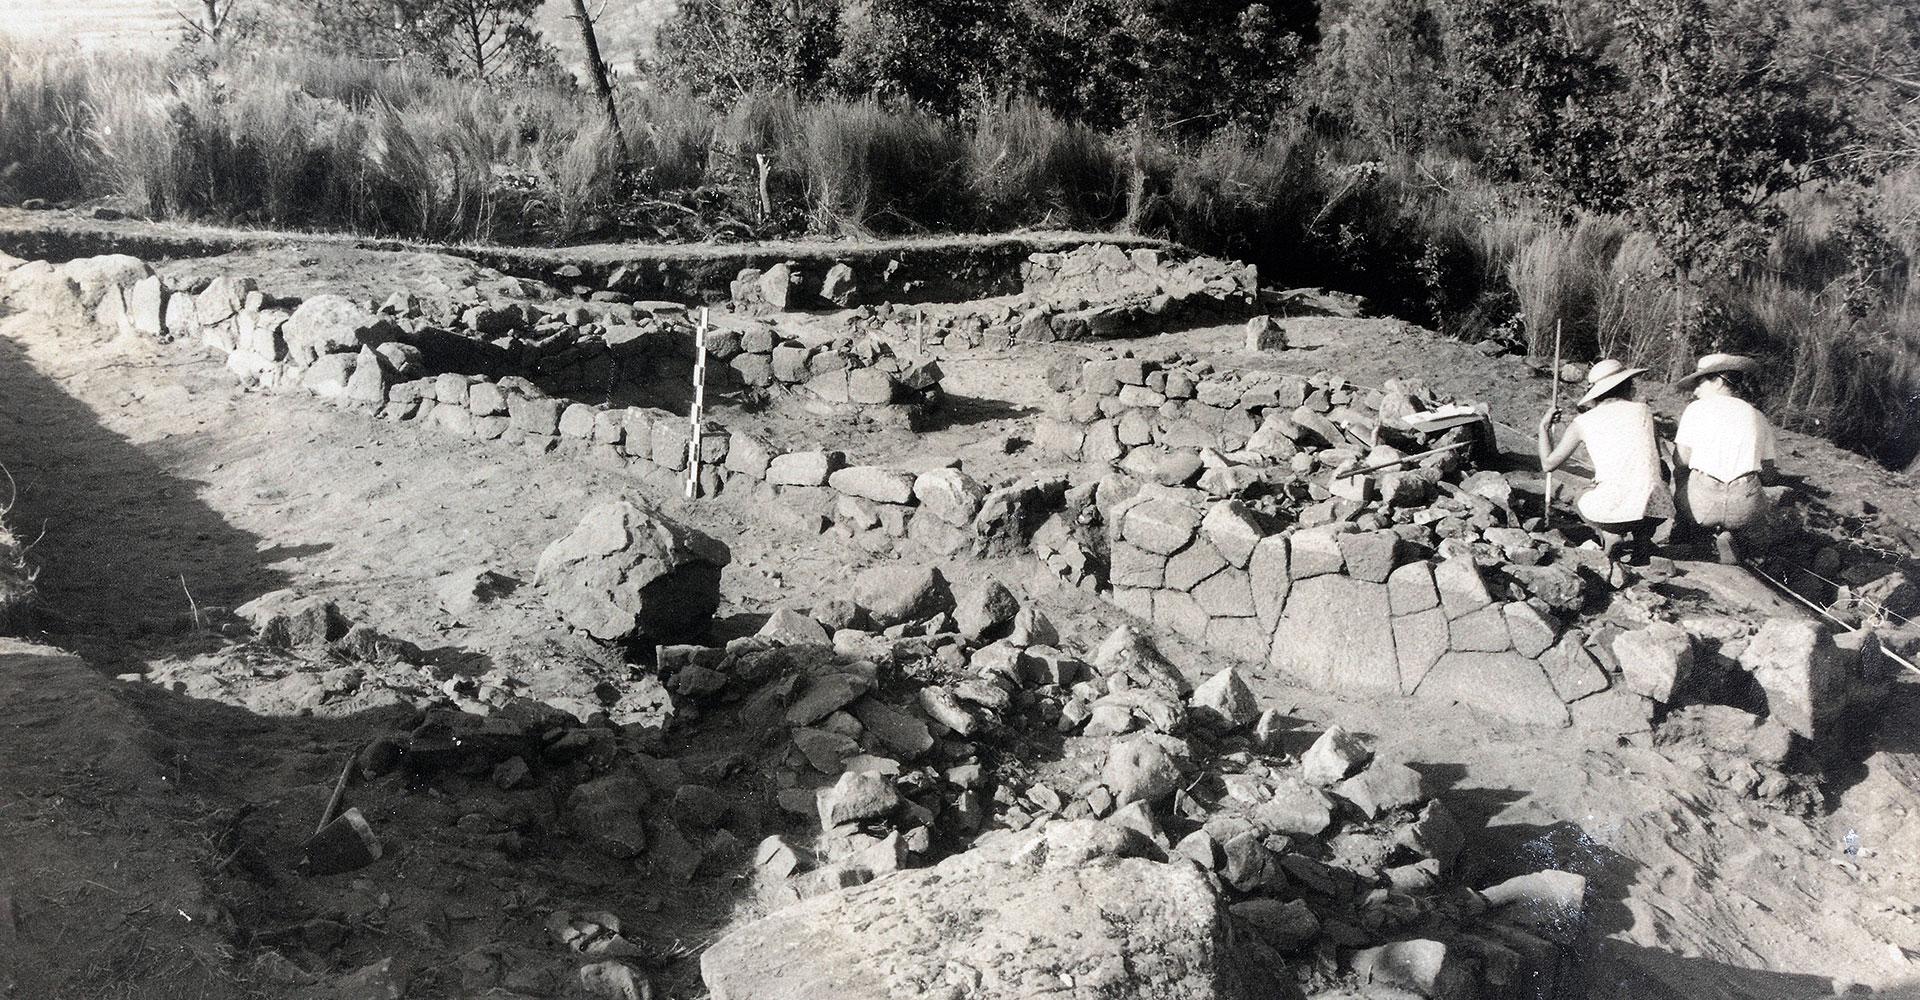 Campo Arqueológico de la Sierra de Aboboreira